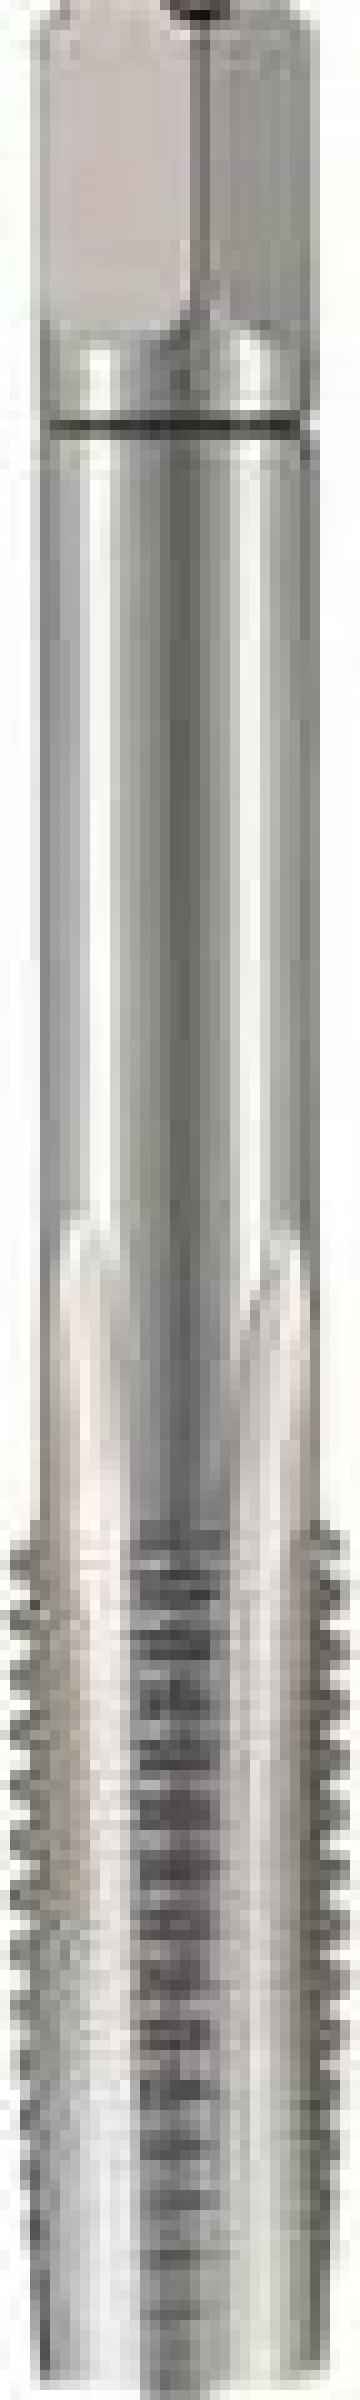 Tarod universal manual 1054-710 de la Nascom Invest